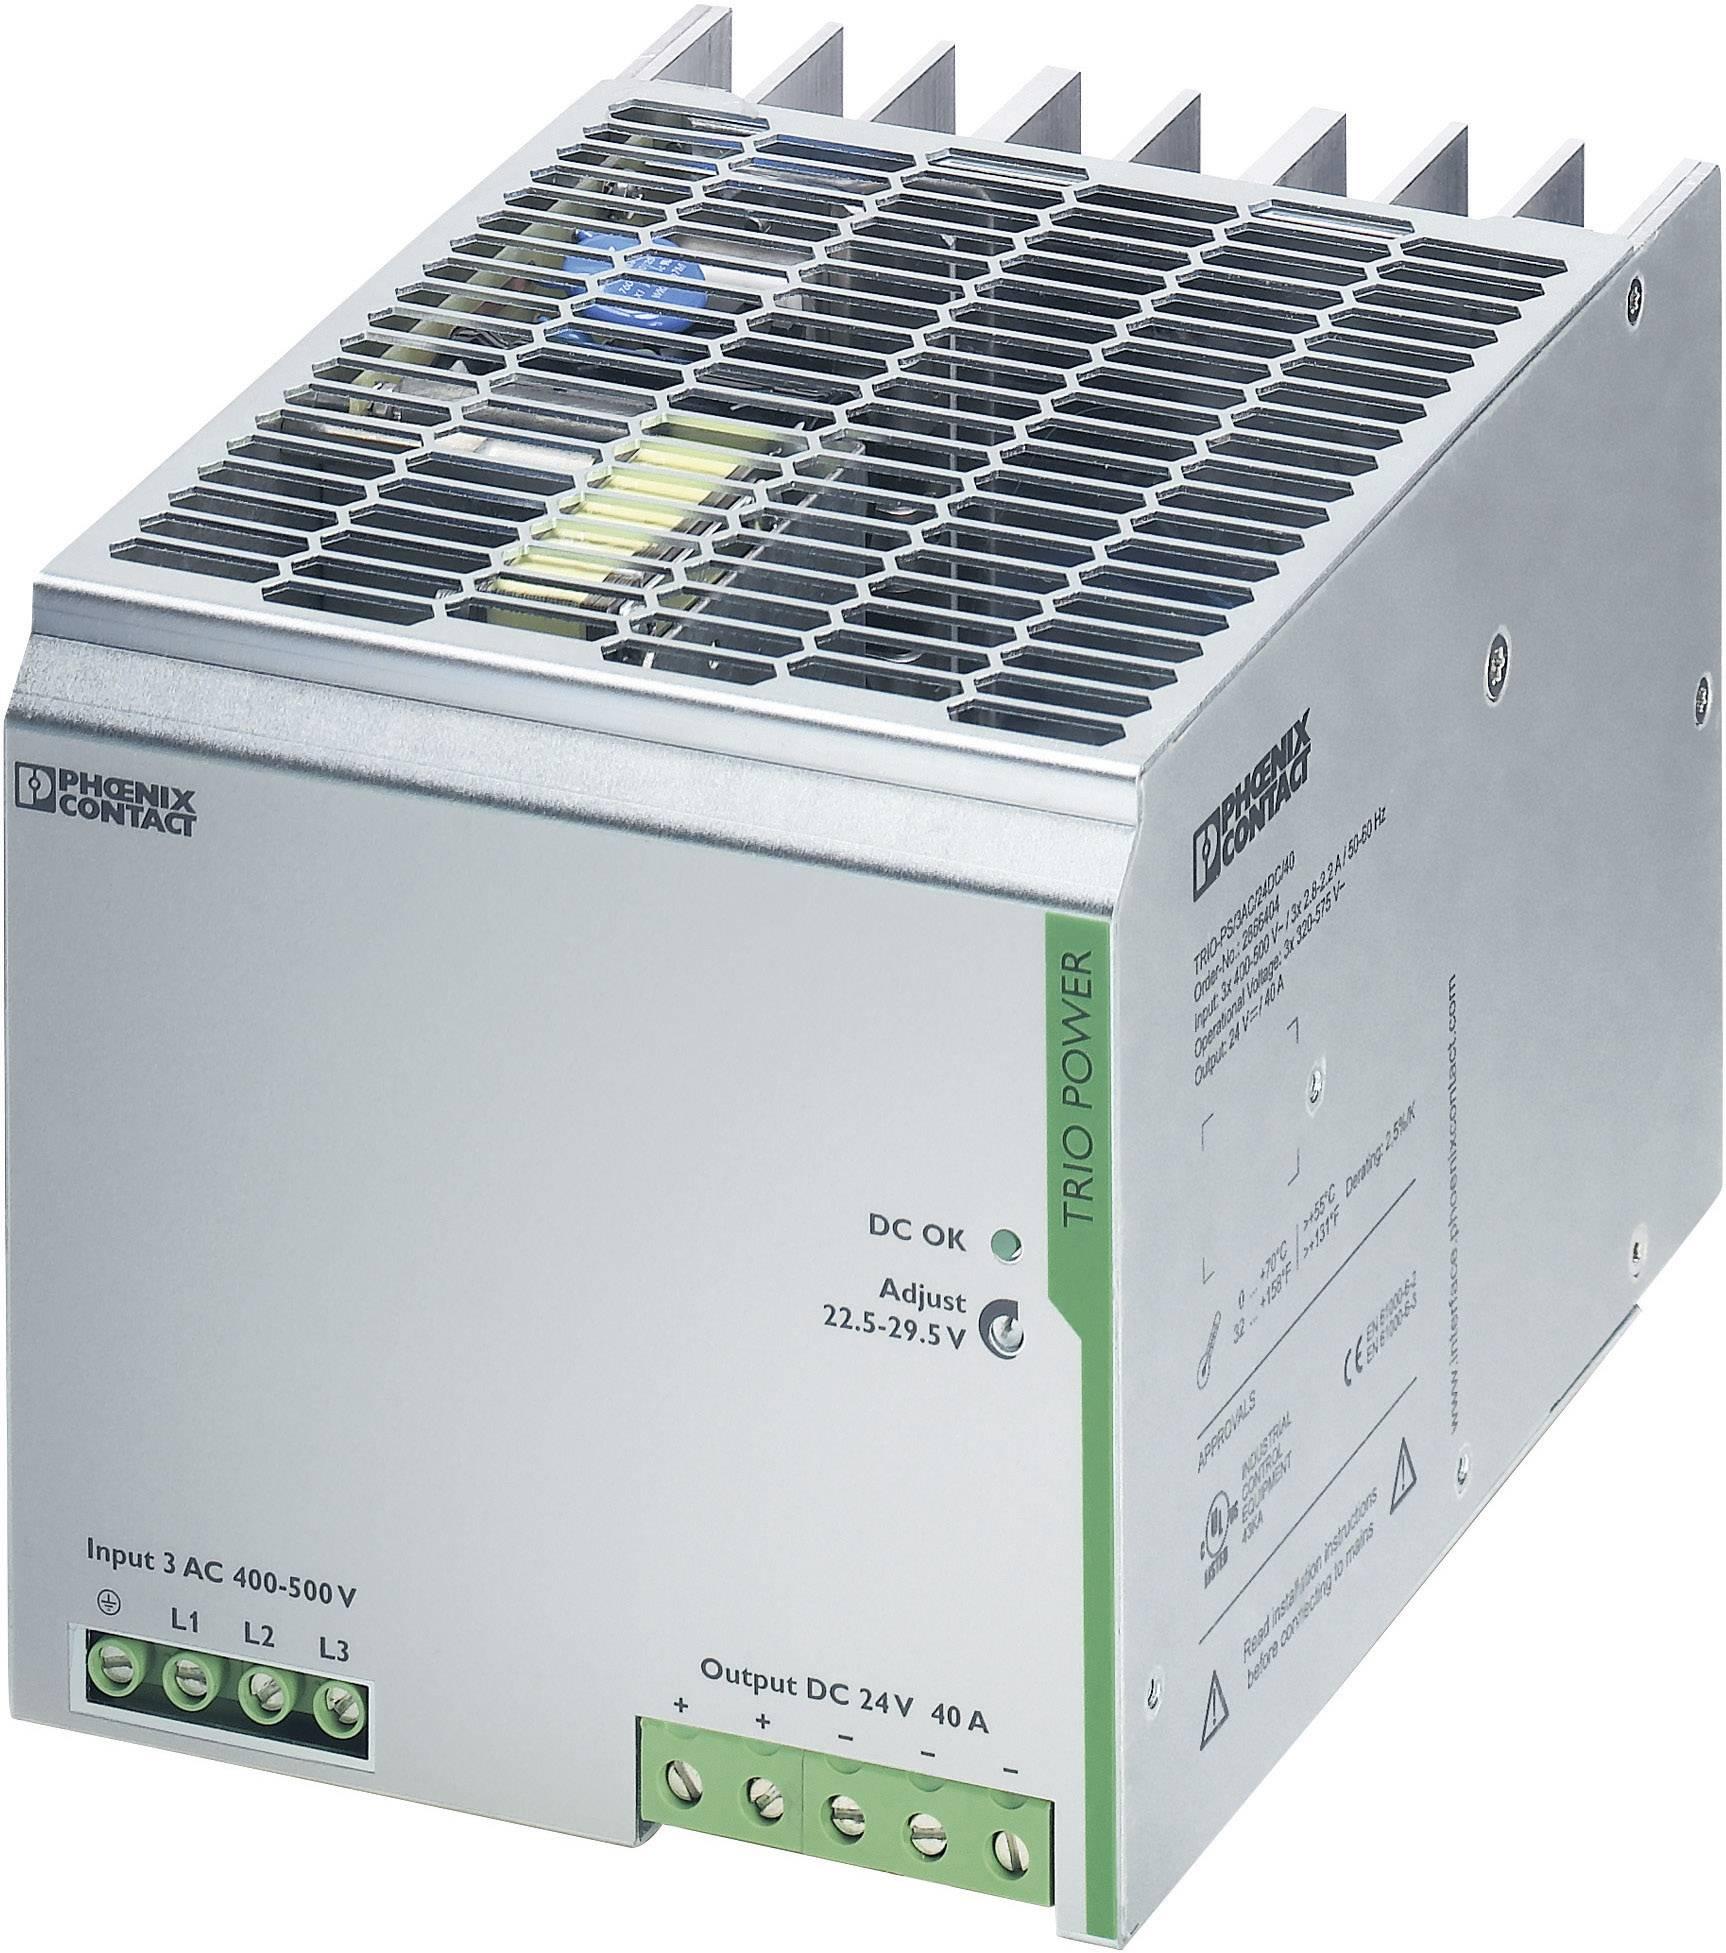 Sieťový zdroj na montážnu lištu (DIN lištu) Phoenix Contact TRIO-PS/3AC/24DC/40, 1 x, 24 V/DC, 40 A, 960 W